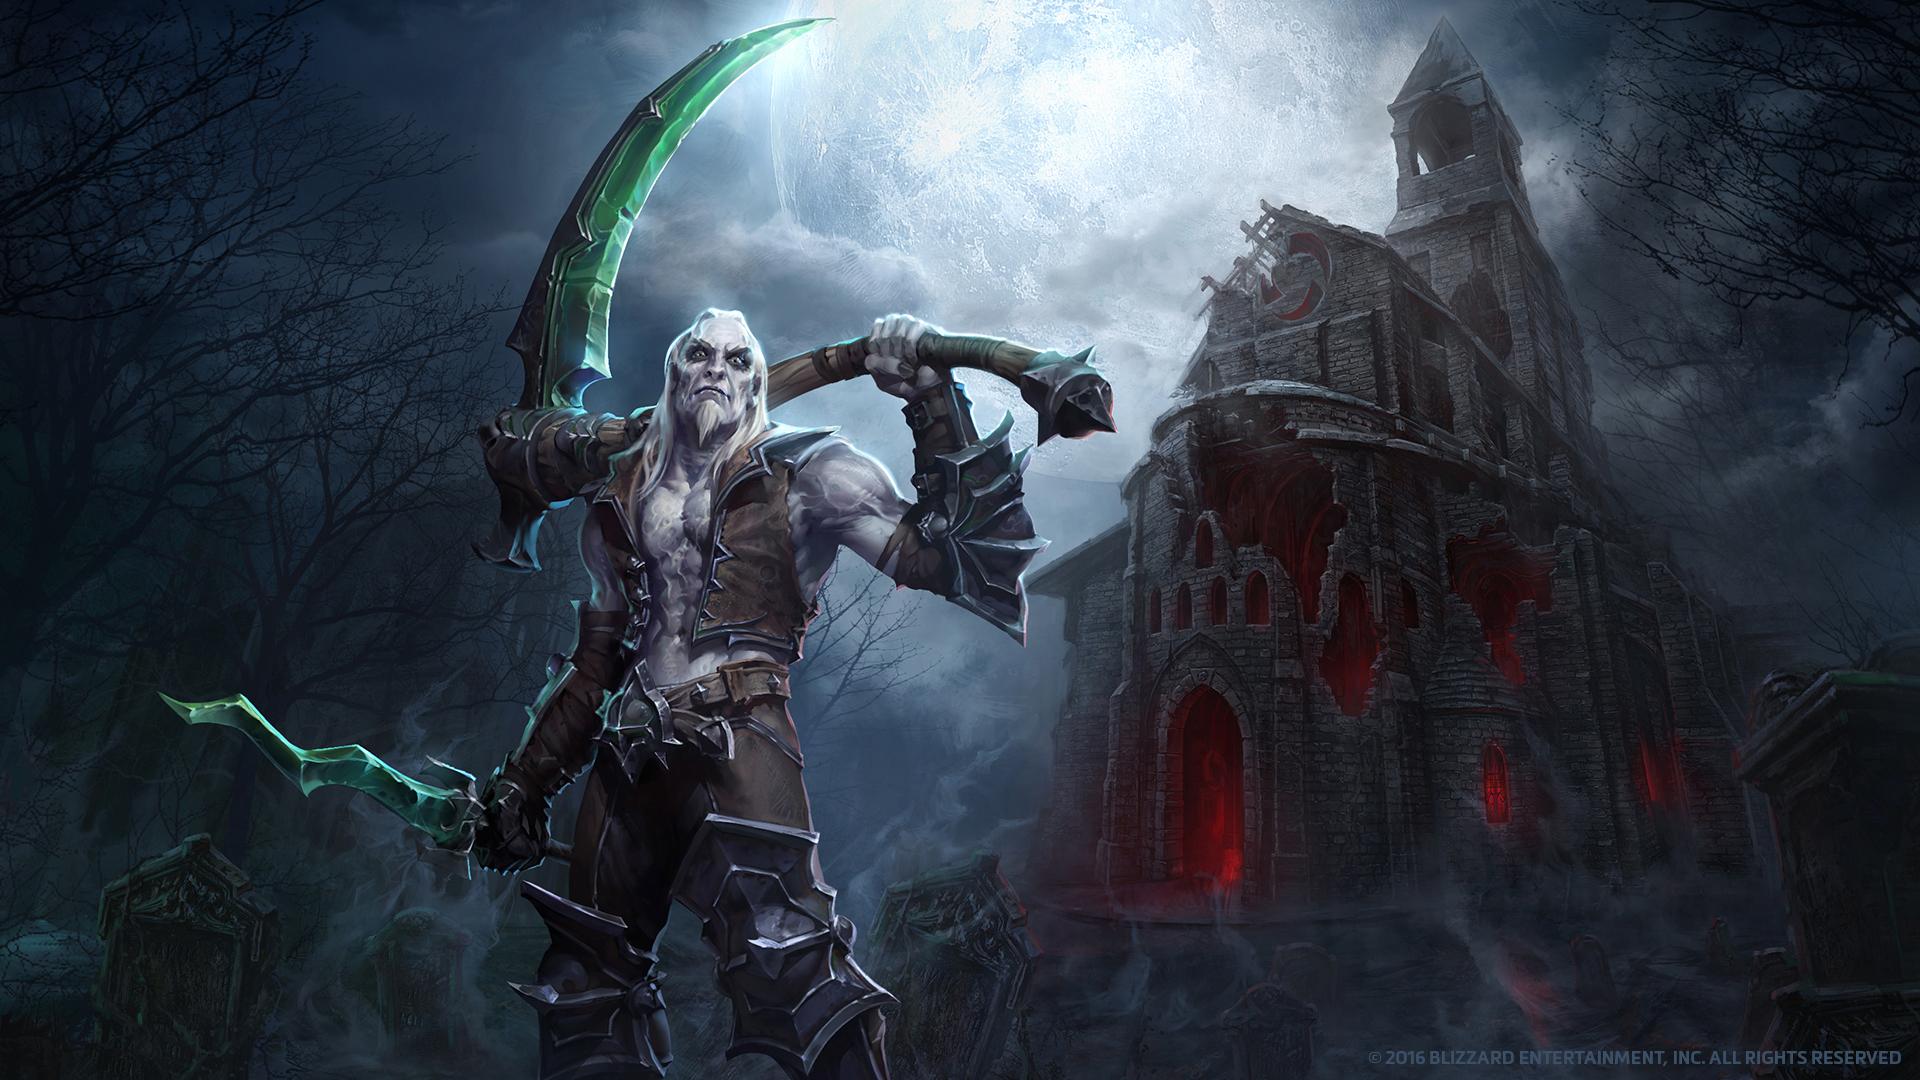 Wallpaper : Diablo 3 Reaper Of Souls, Mr Jack Luke Mancini